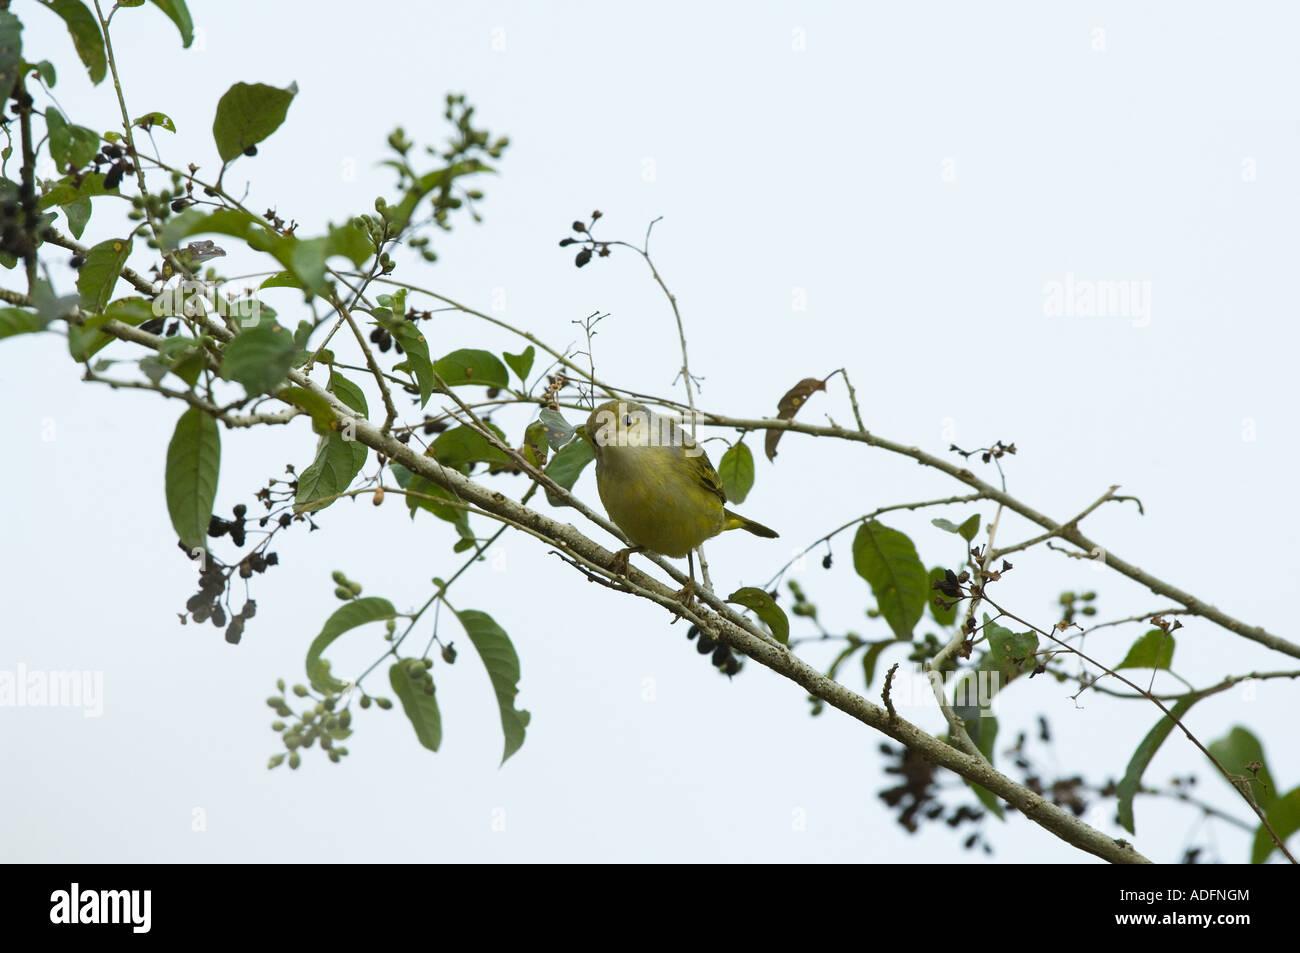 Yellow Warbler (Dendroica petechia aureola) immature perched on branch, Los Gemelos, Santa Cruz, Galapagos Ecuador - Stock Image